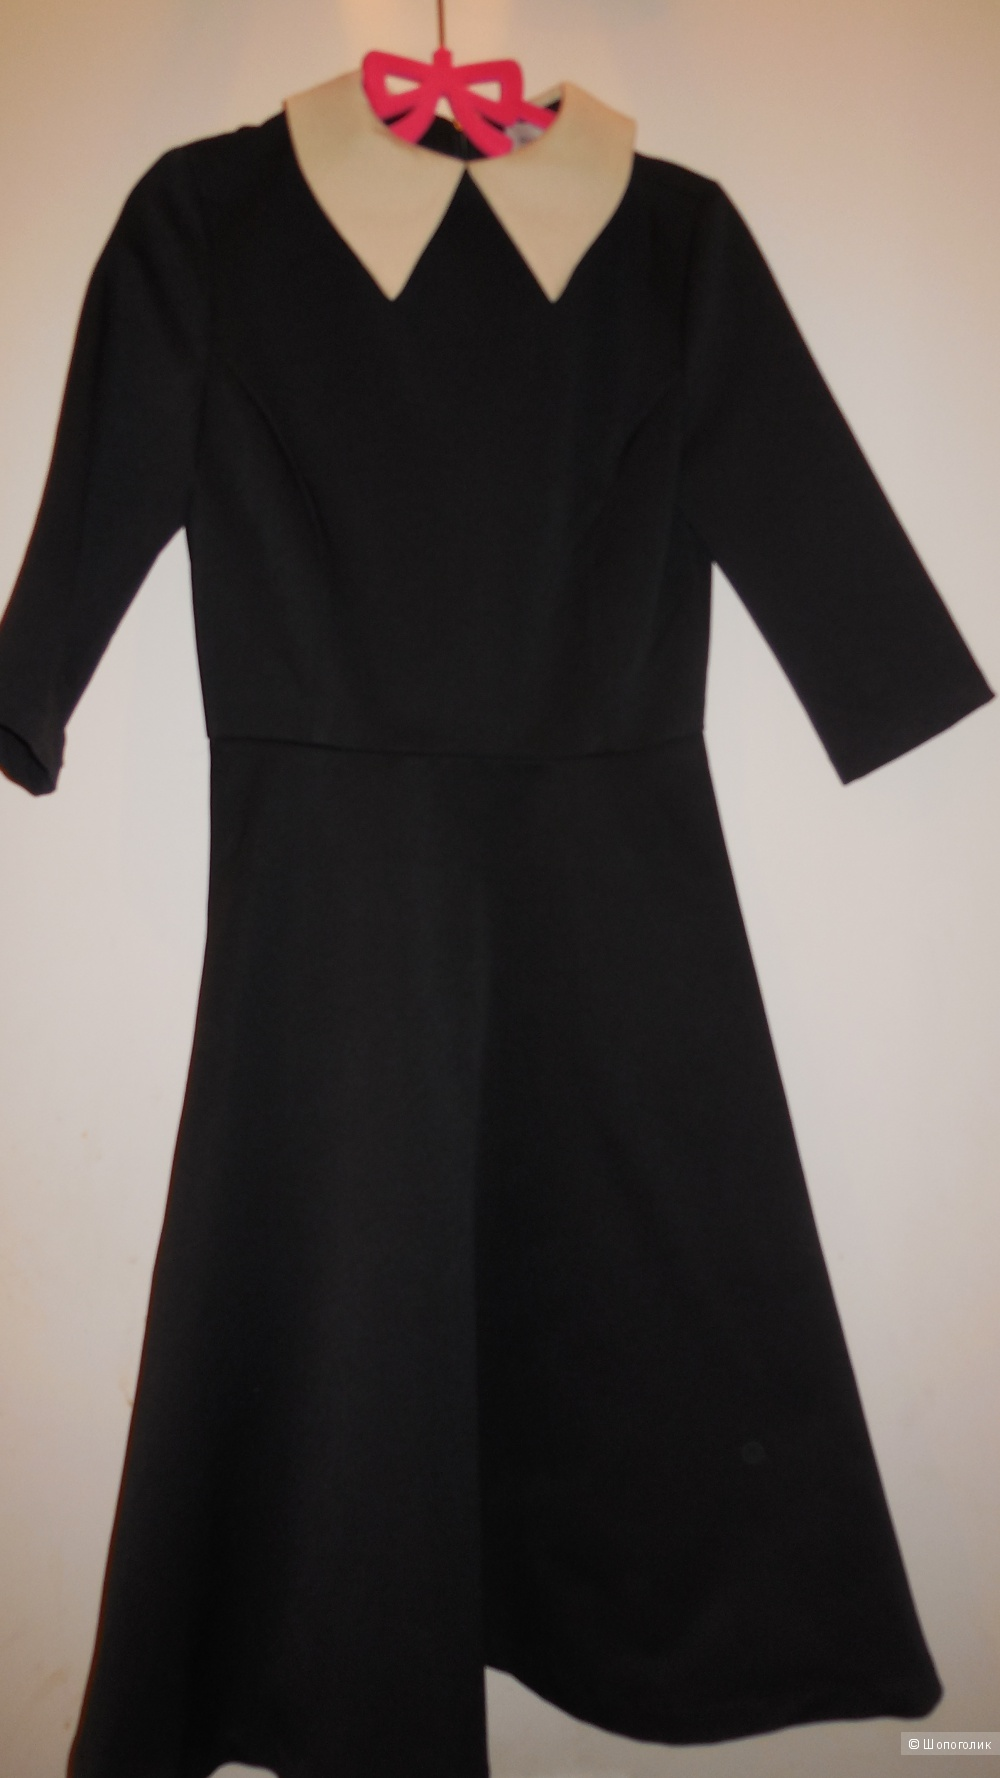 Платье Sultanna Frantsuzova, размер S(42).